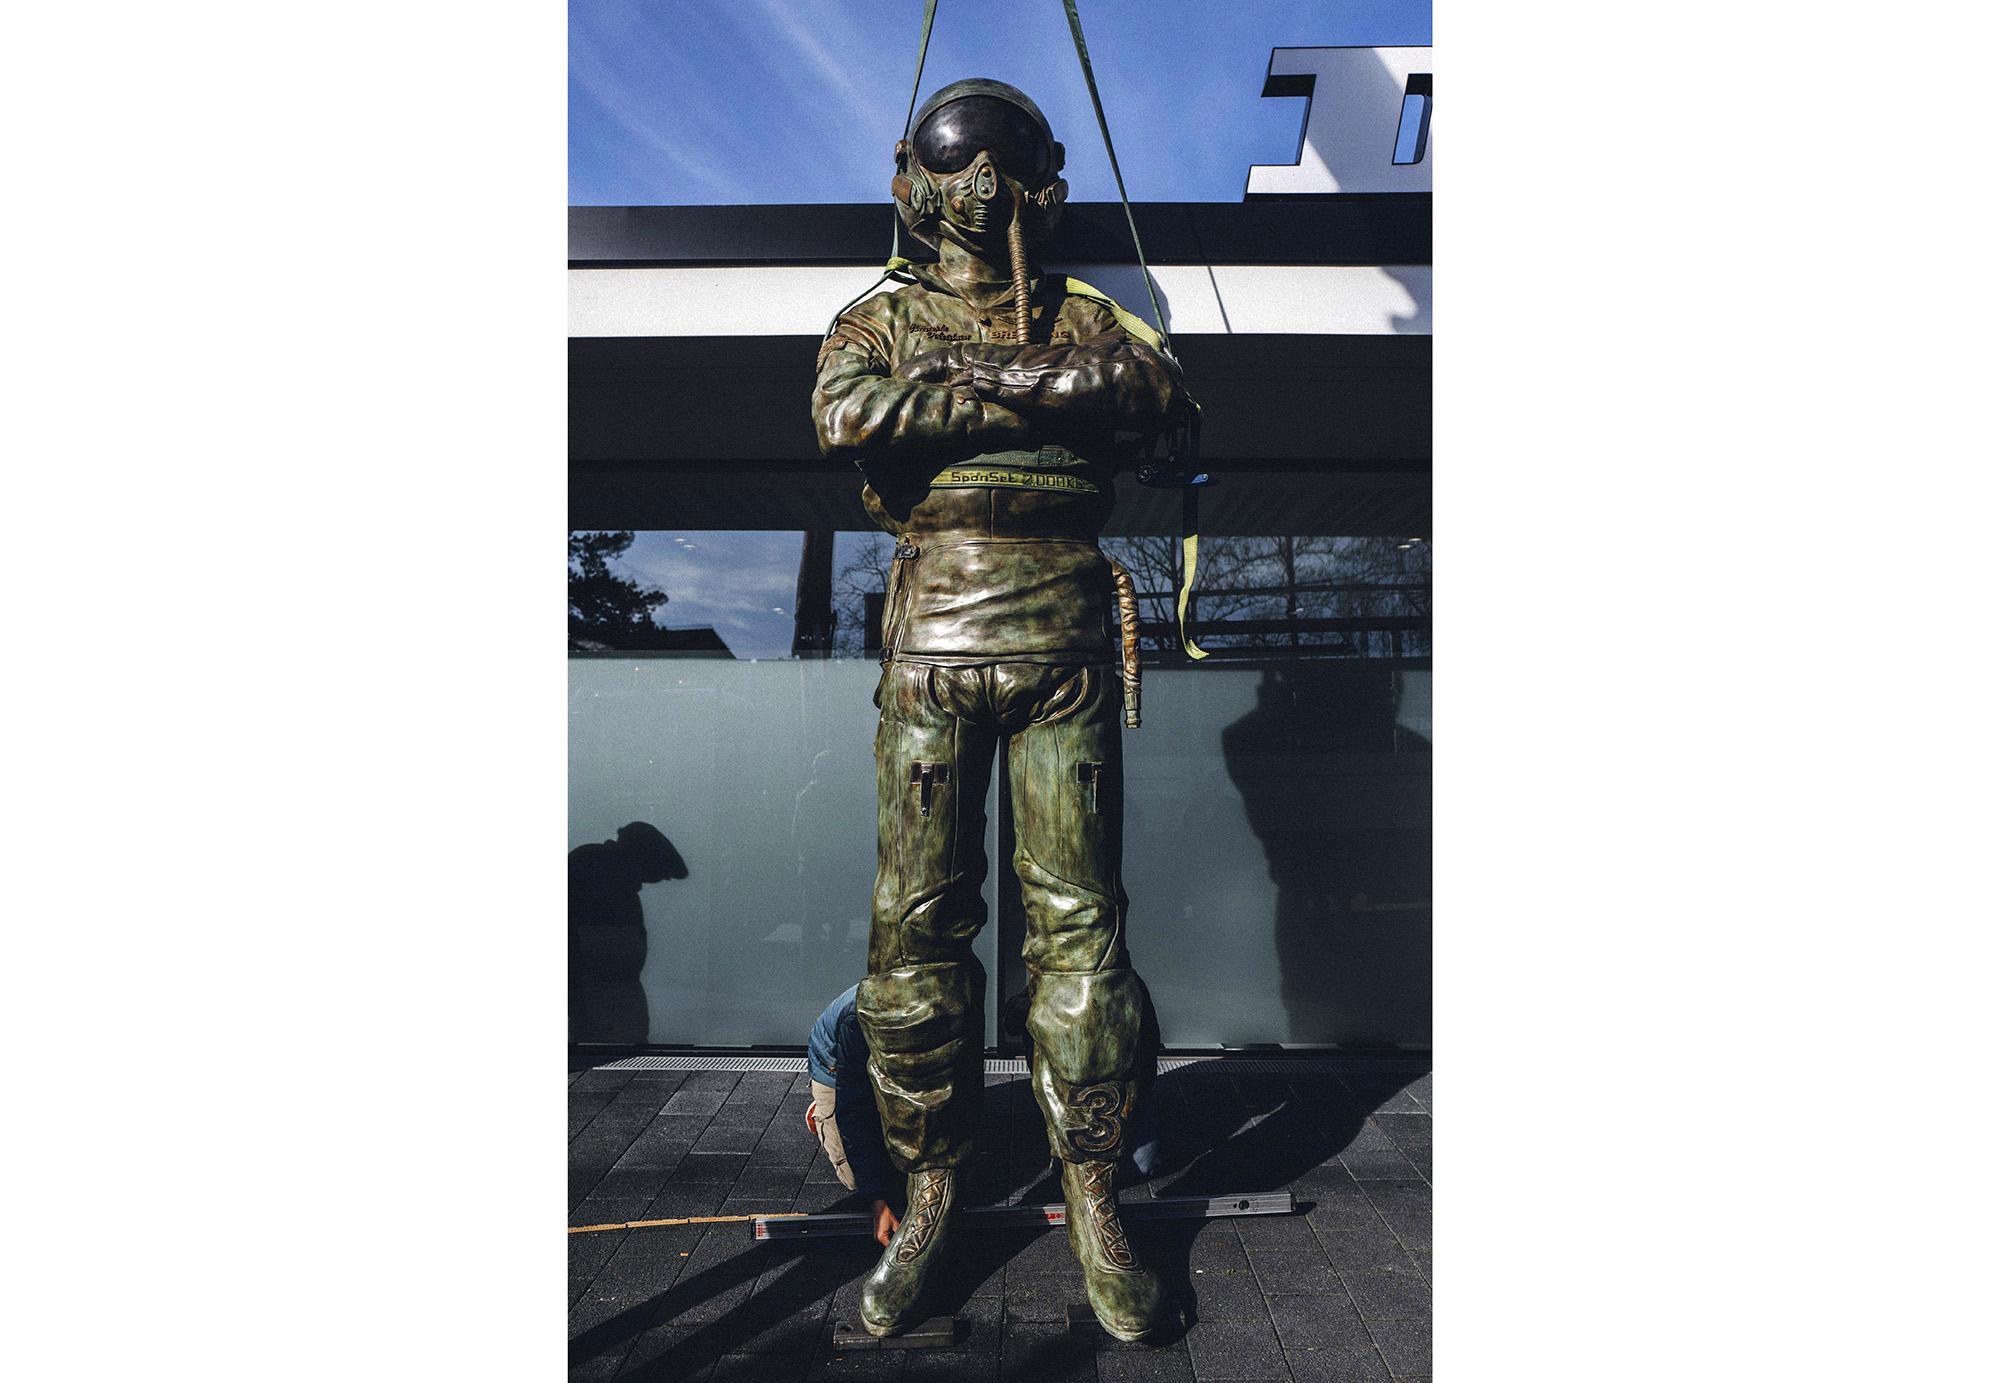 pilote adatte – 007